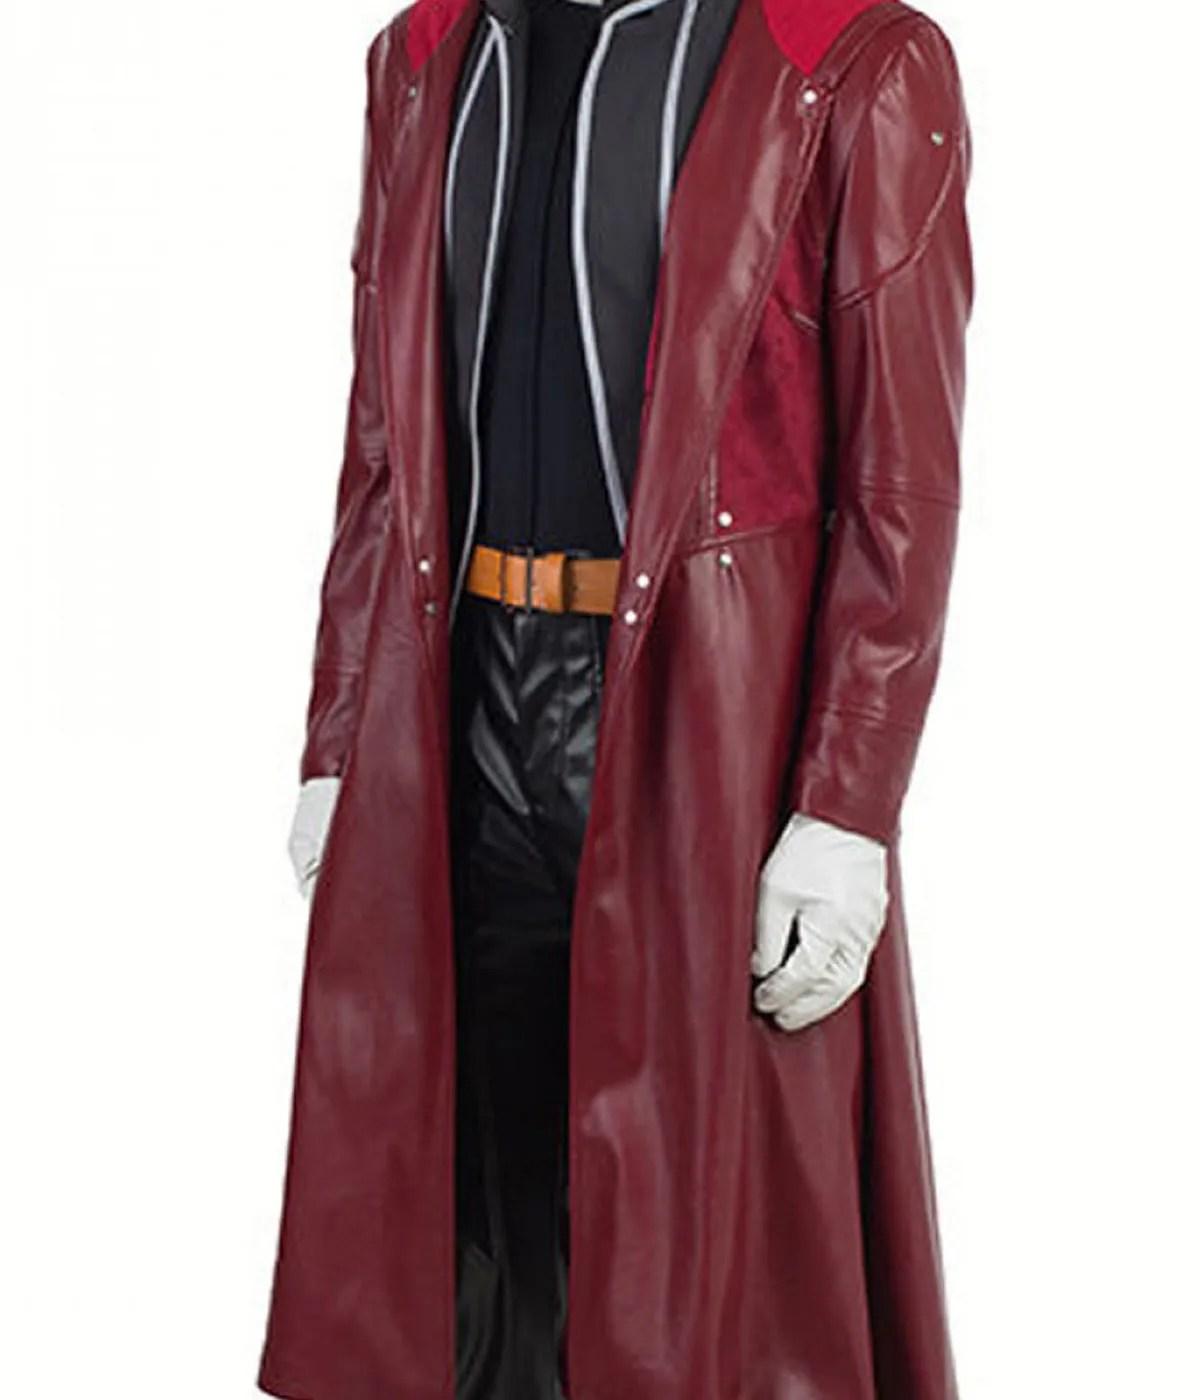 fullmetal-alchemist-edward-elric-leather-coat